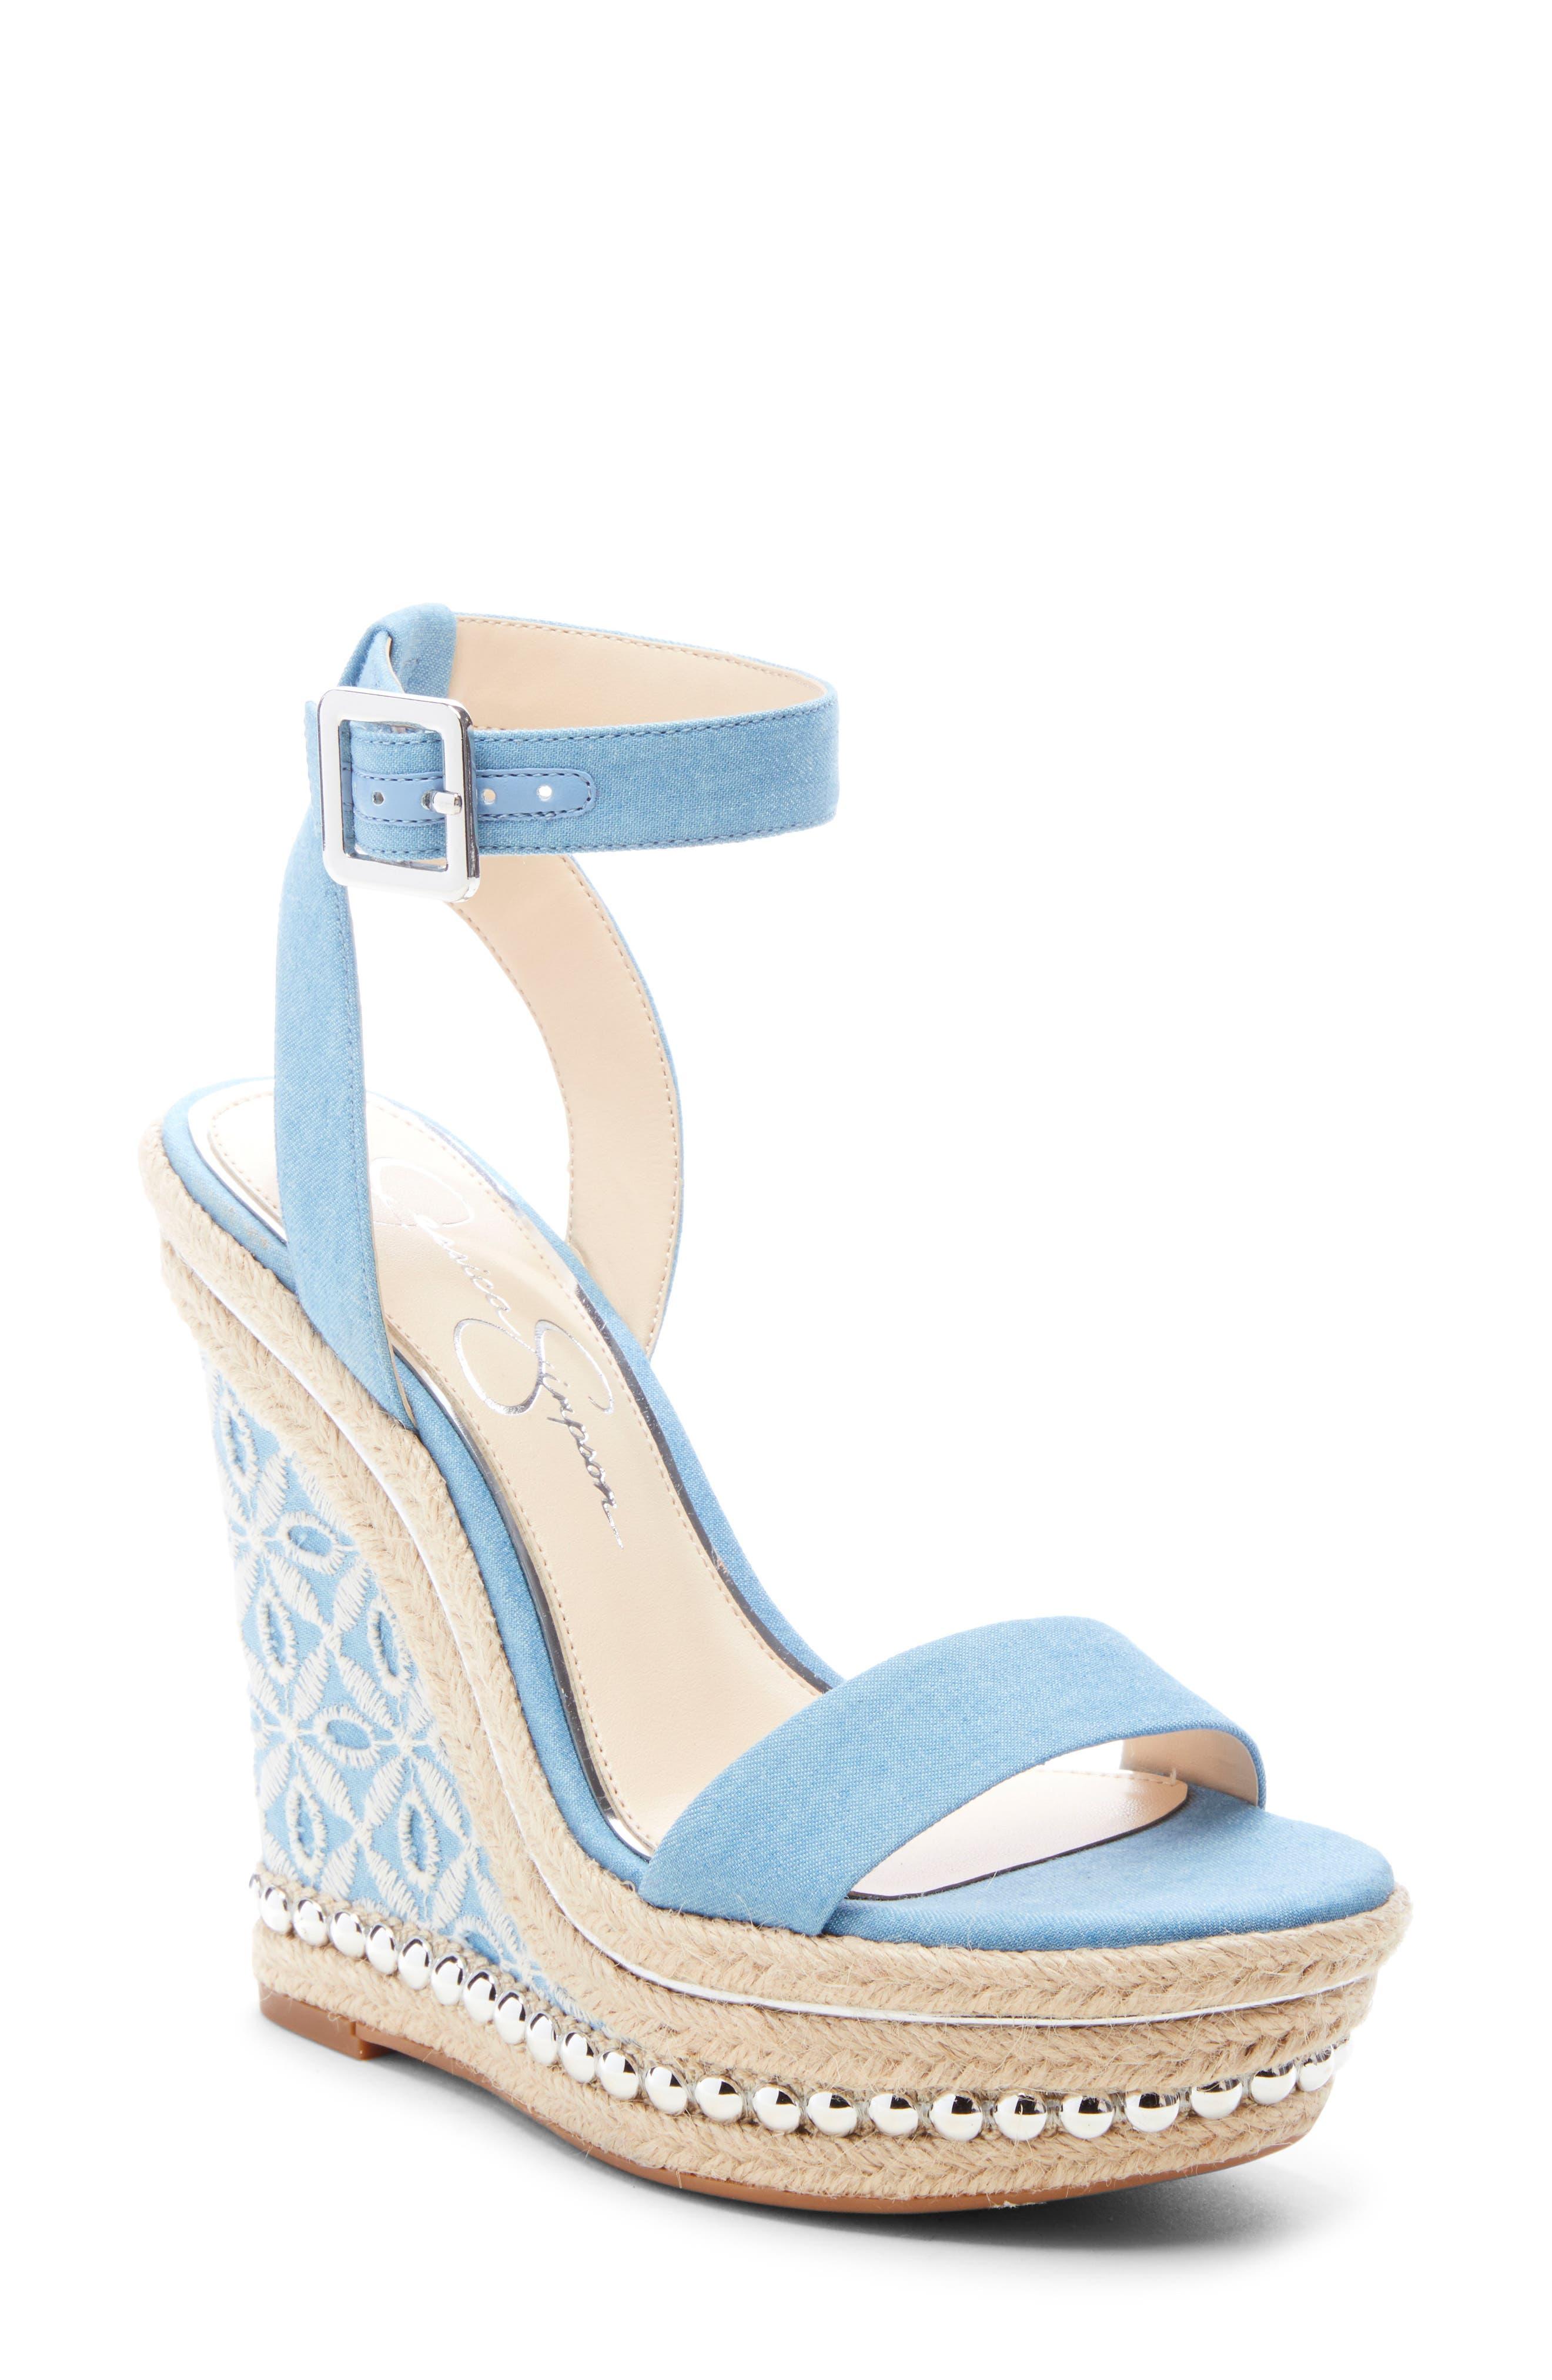 Jessica Simpson Alinda Embellished Wedge Sandal- Blue